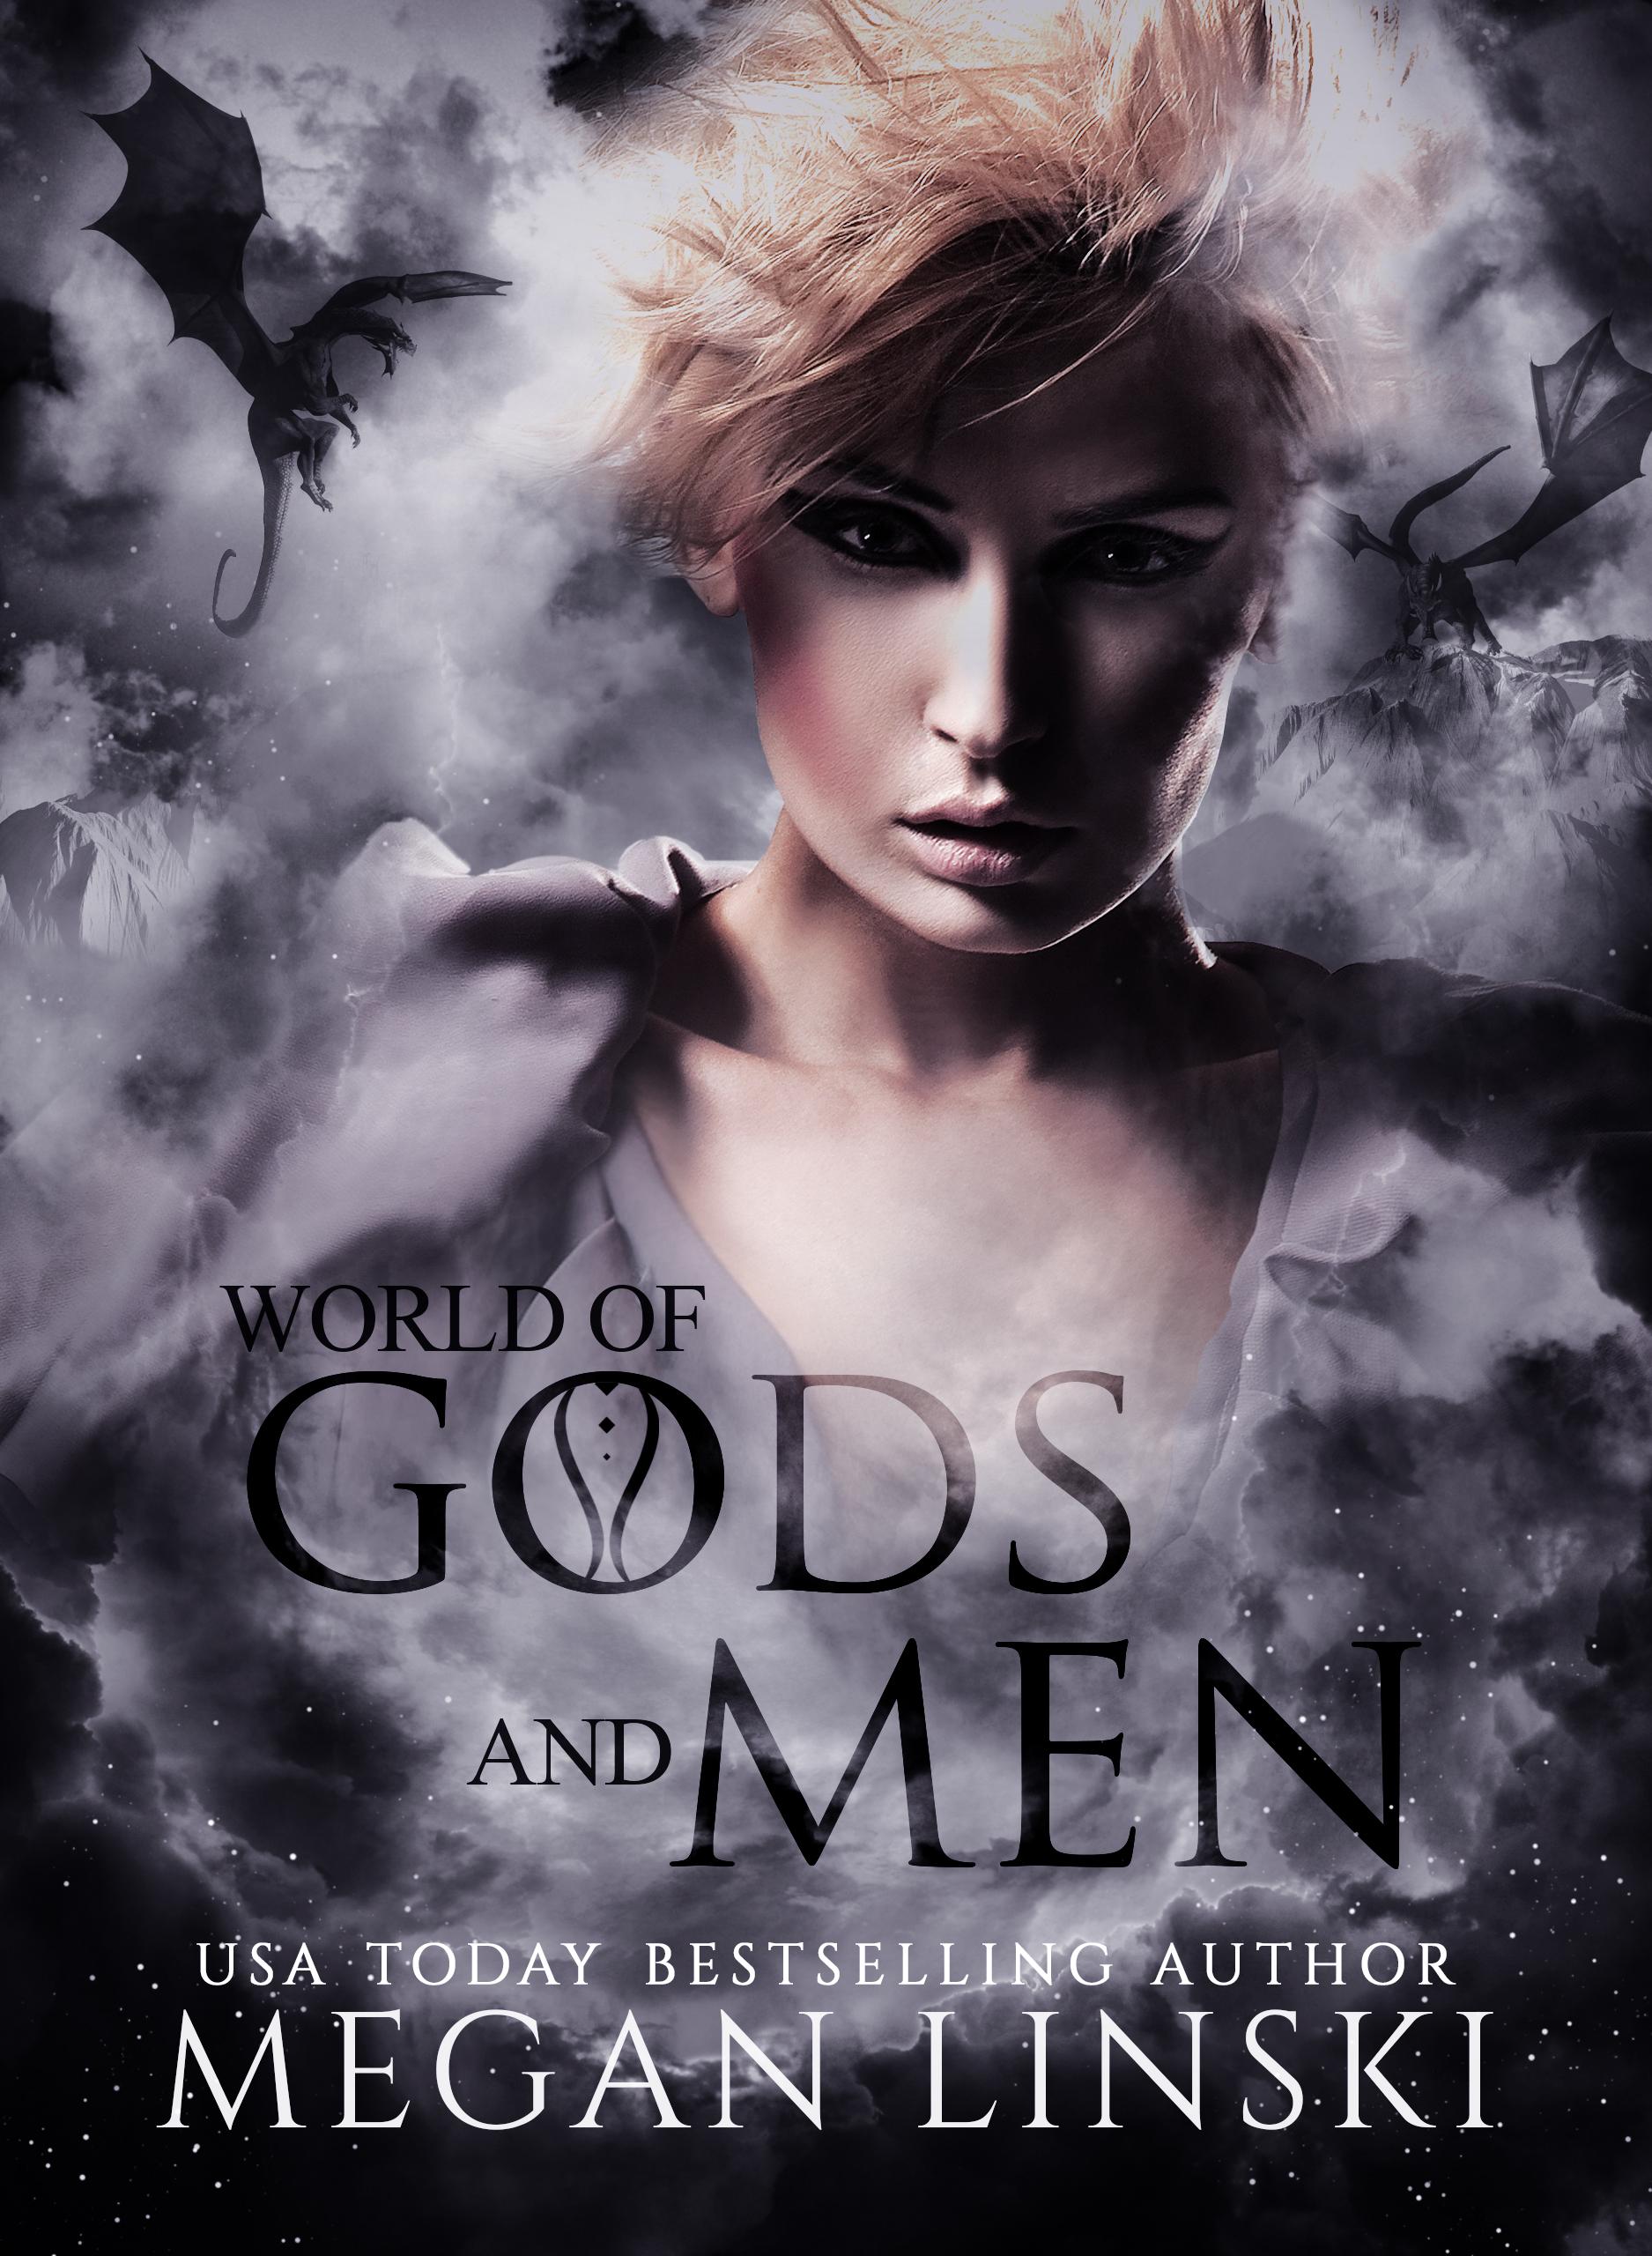 World of Gods and Men